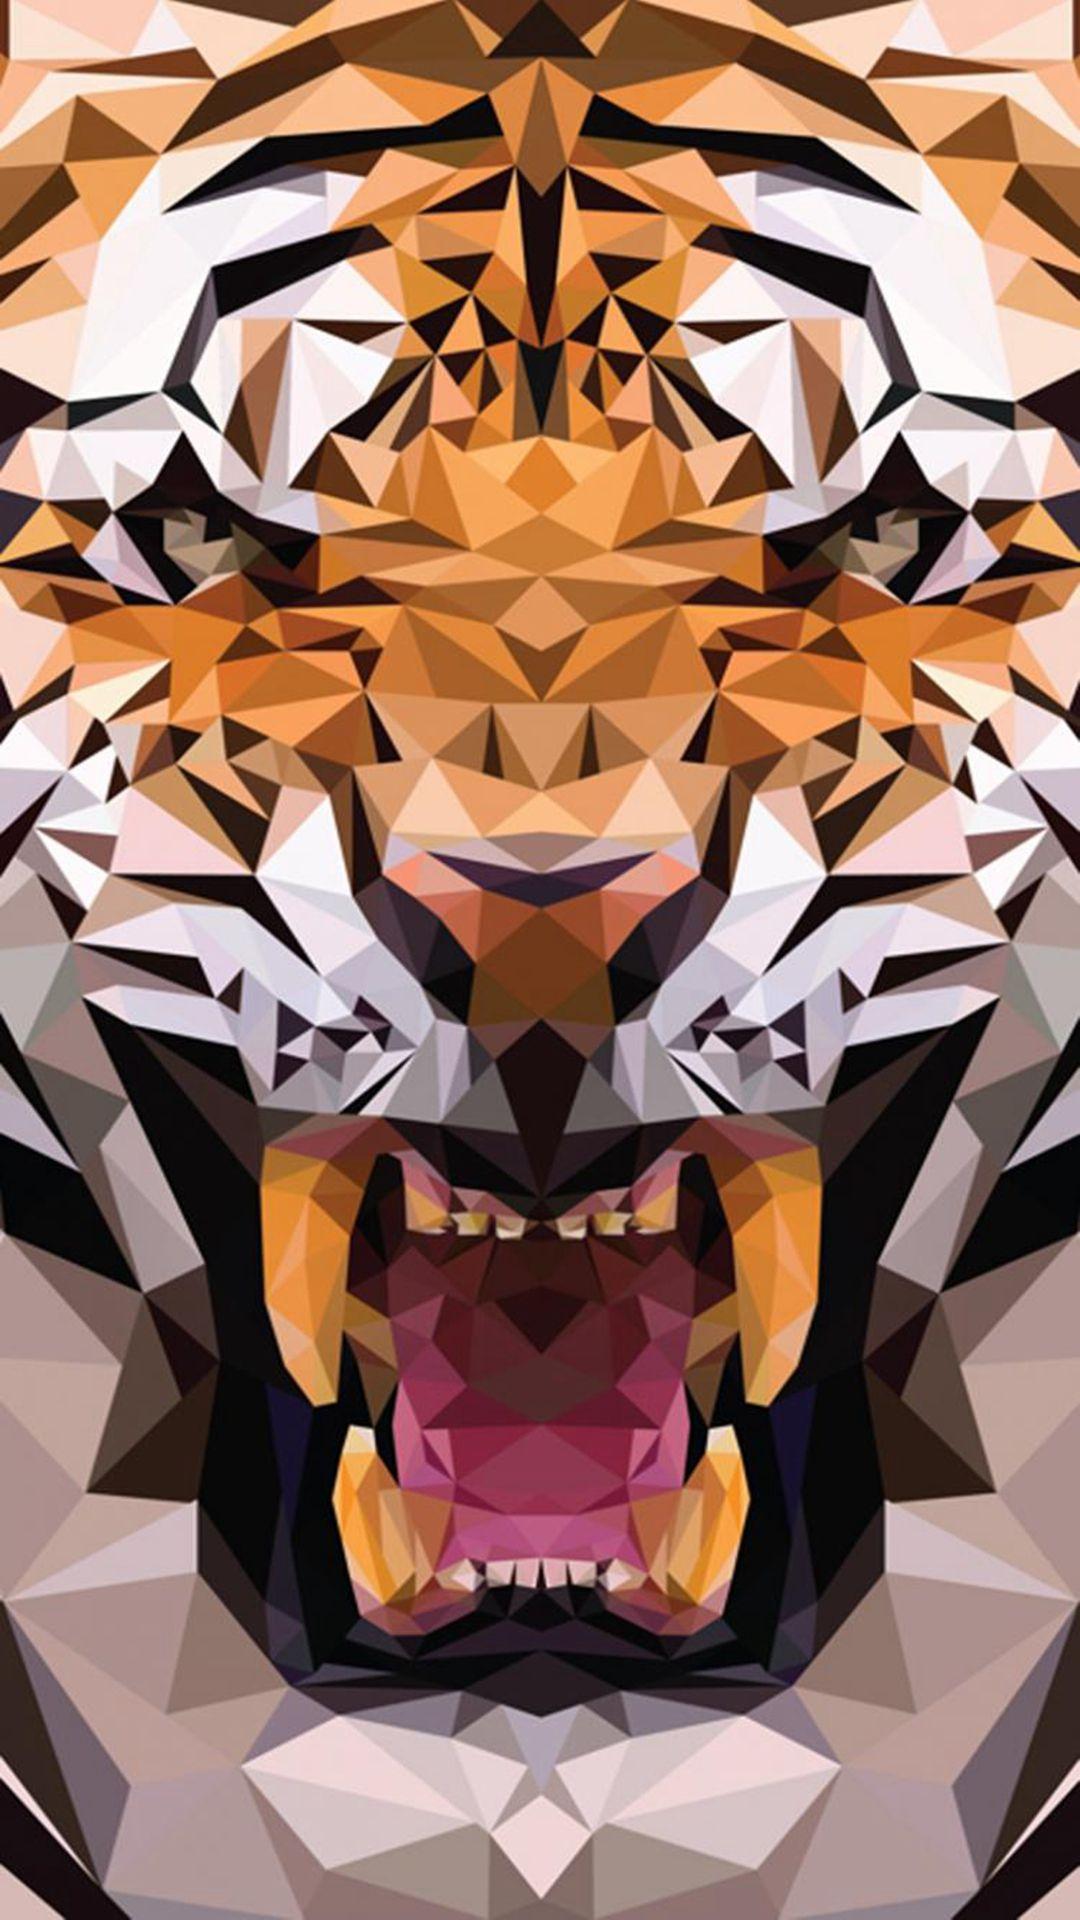 IOS8 Animals Tiger Polygon Pattern Drawn IPhone 6 Plus Wallpaper